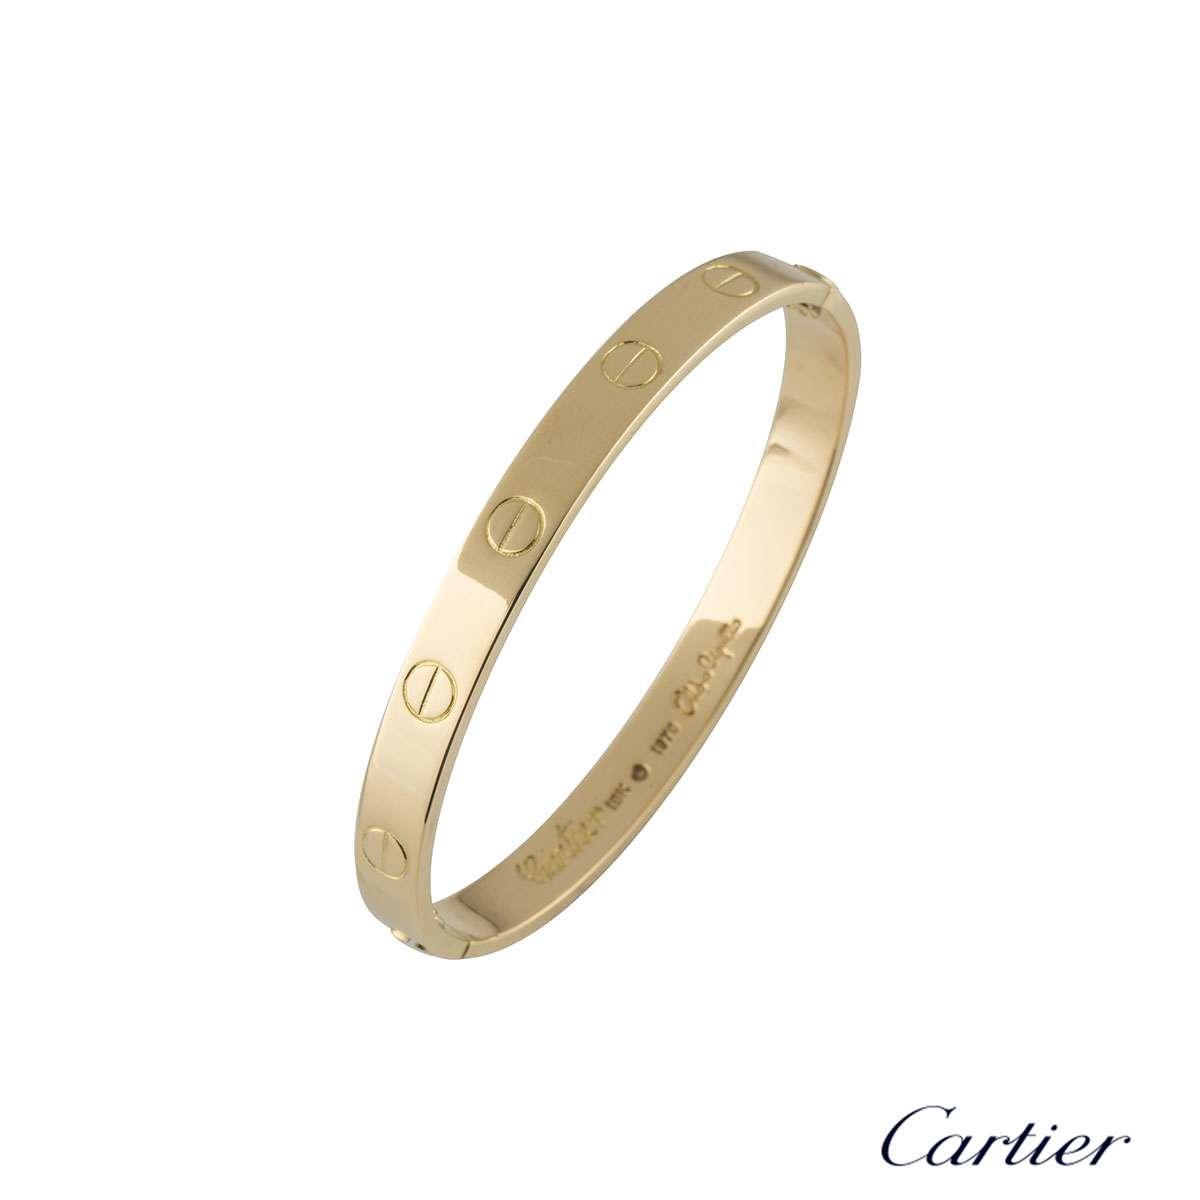 Cartier Love Aldo Cipullo Bracelet Size 16